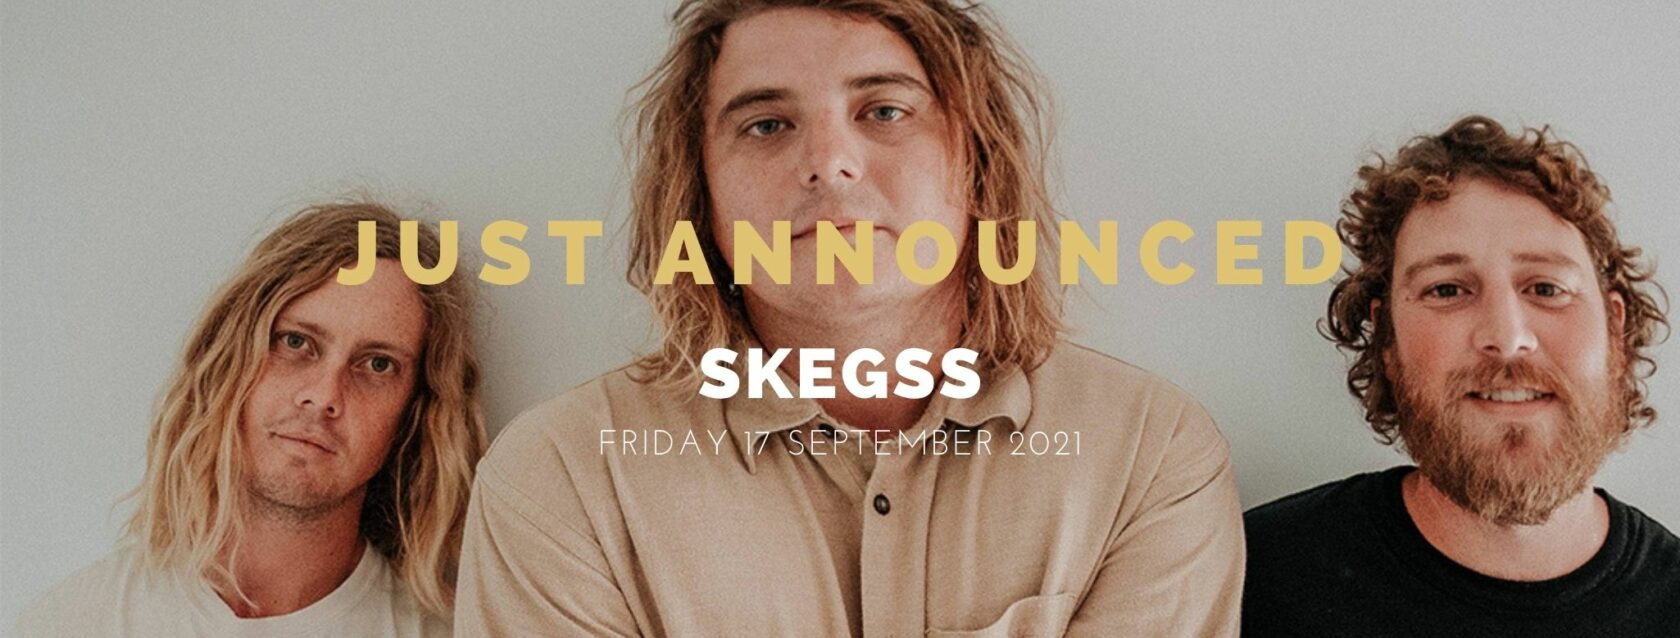 Skegss Announcement